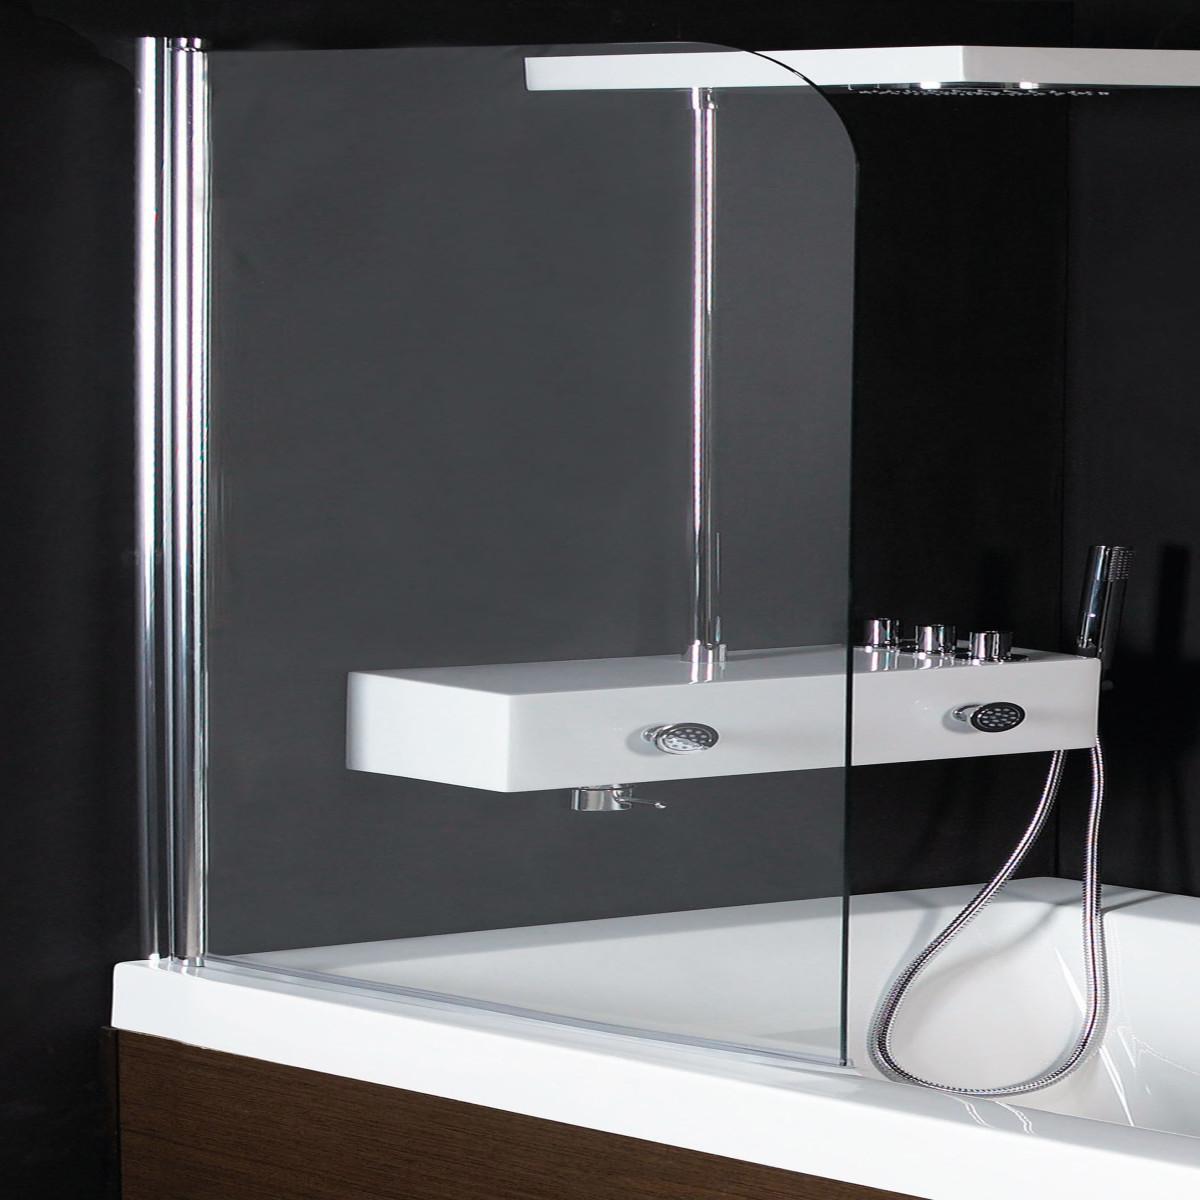 Tamanaco parete sopra vasca 2 ante girevoli prezzo e for Guarnizioni box doccia leroy merlin